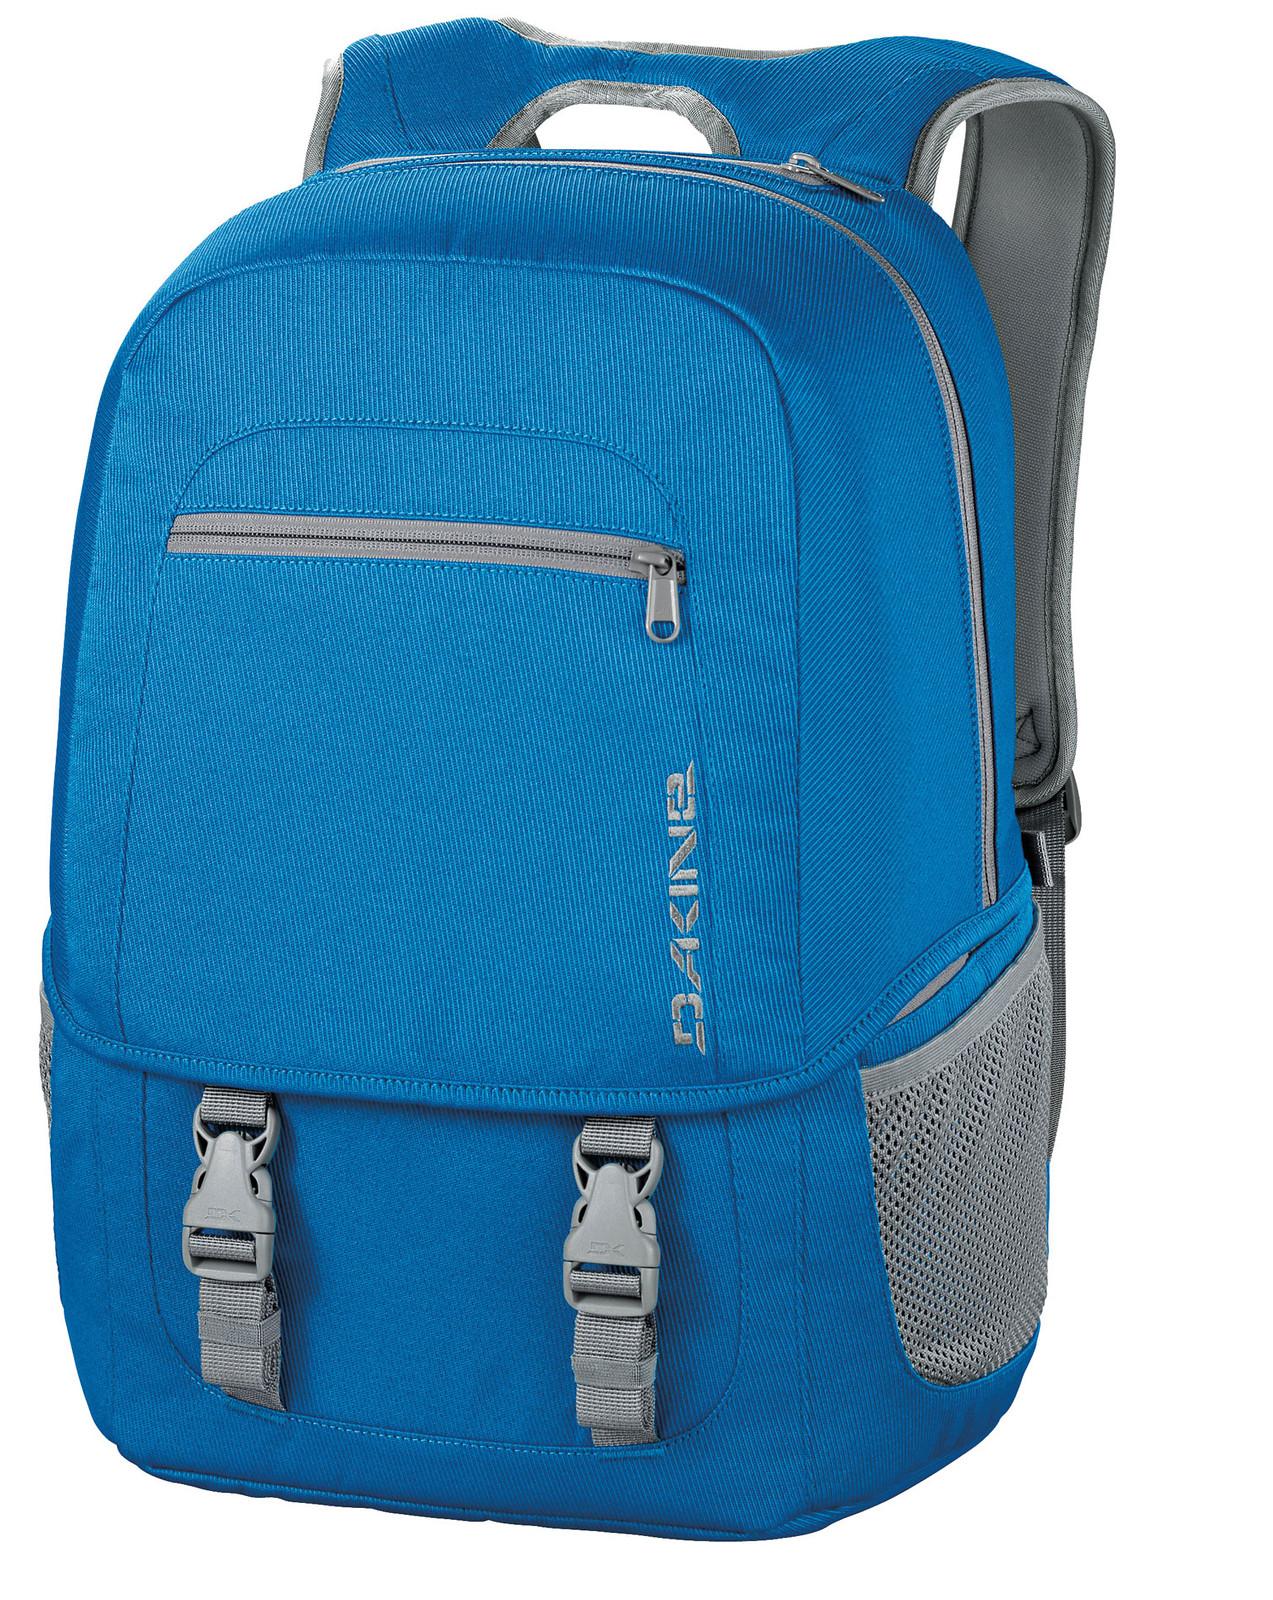 dakine-coast-cooler-pack-blu-11.jpg